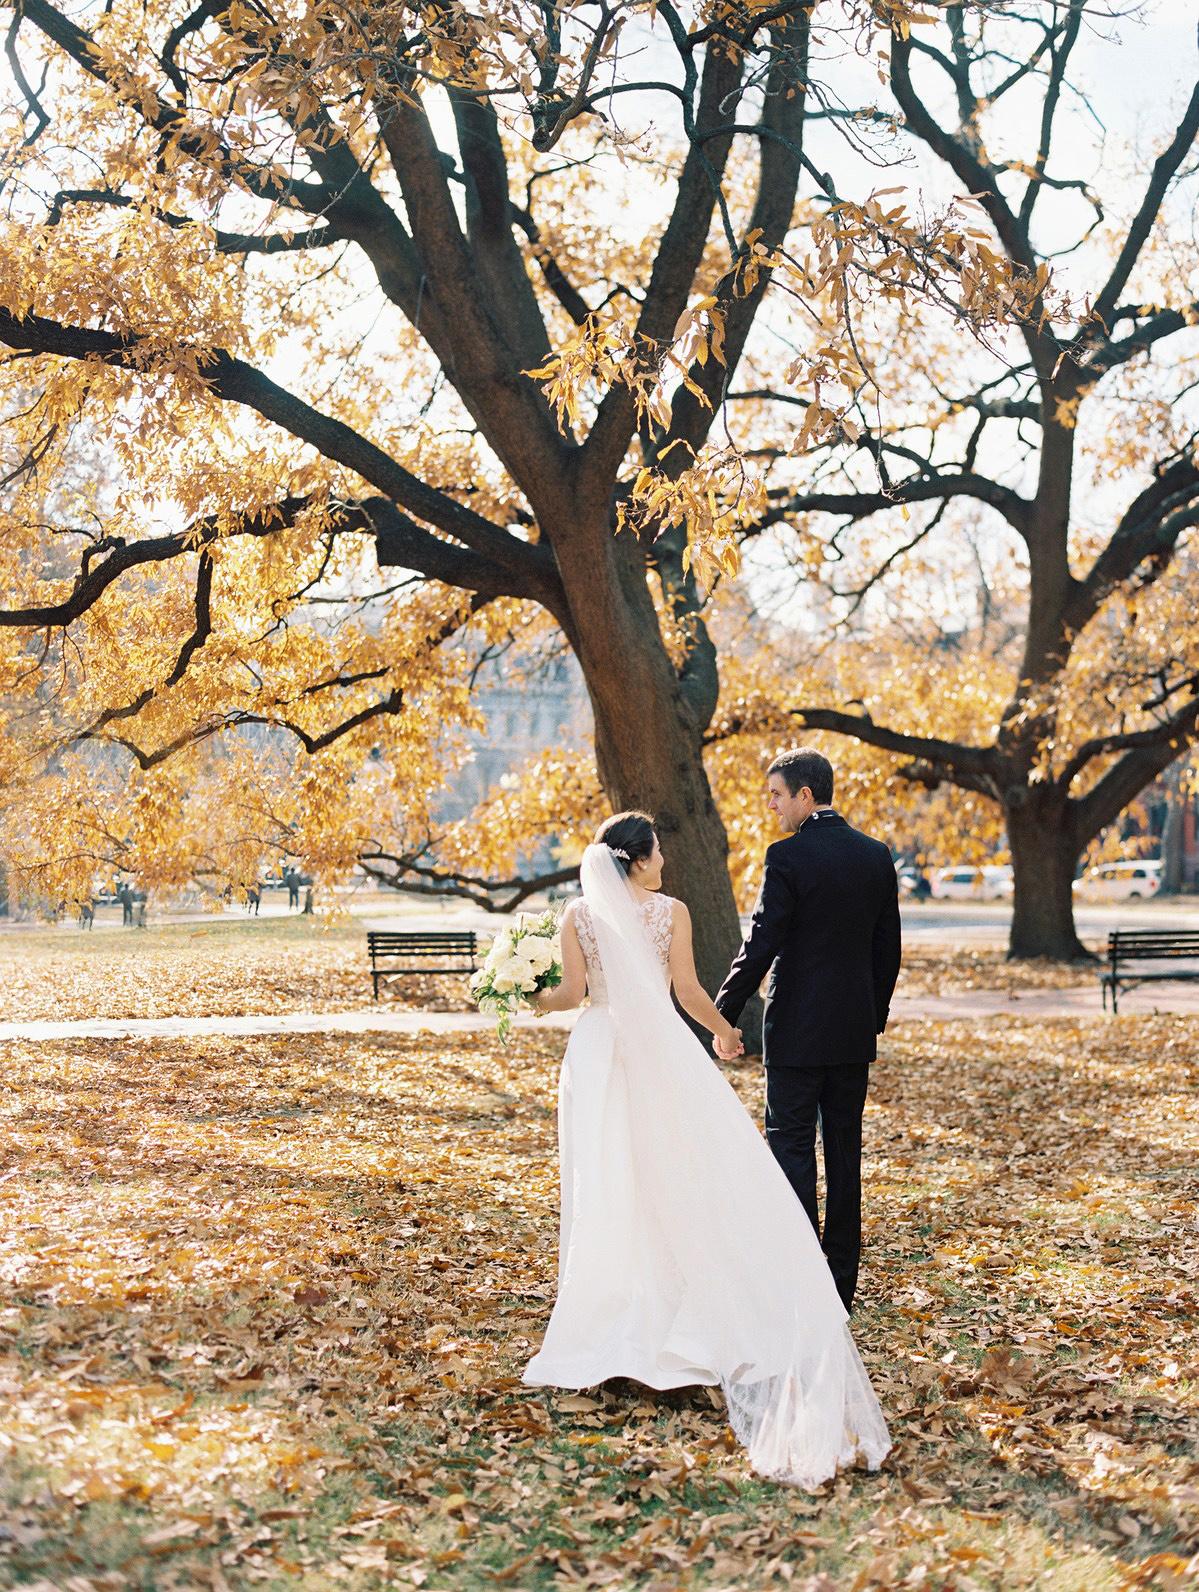 celina rob wedding virginia couple walking leaves